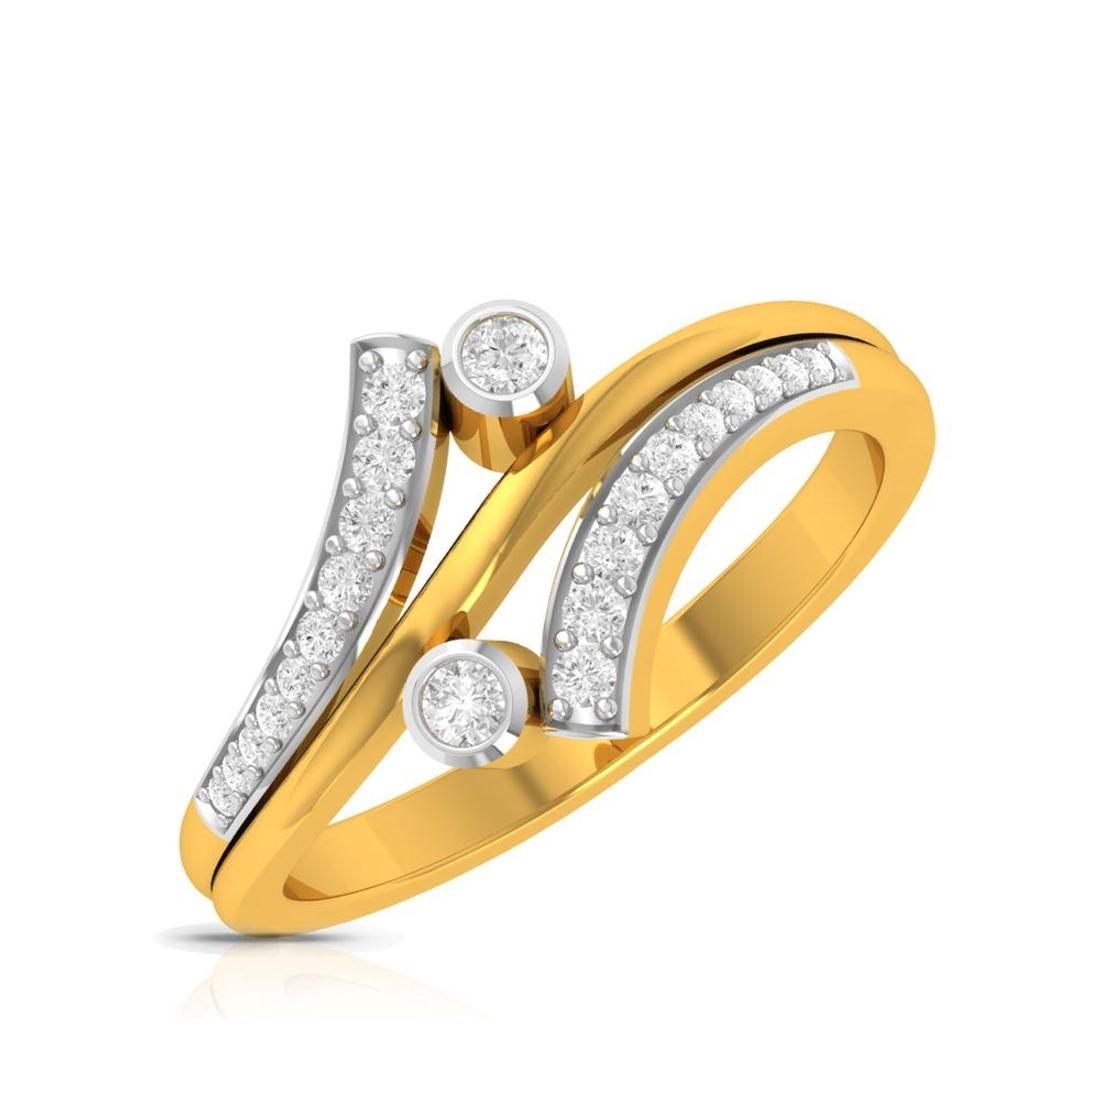 Buy Charu Jewels Diamond Ladies Ring CJLR0052 Online in India